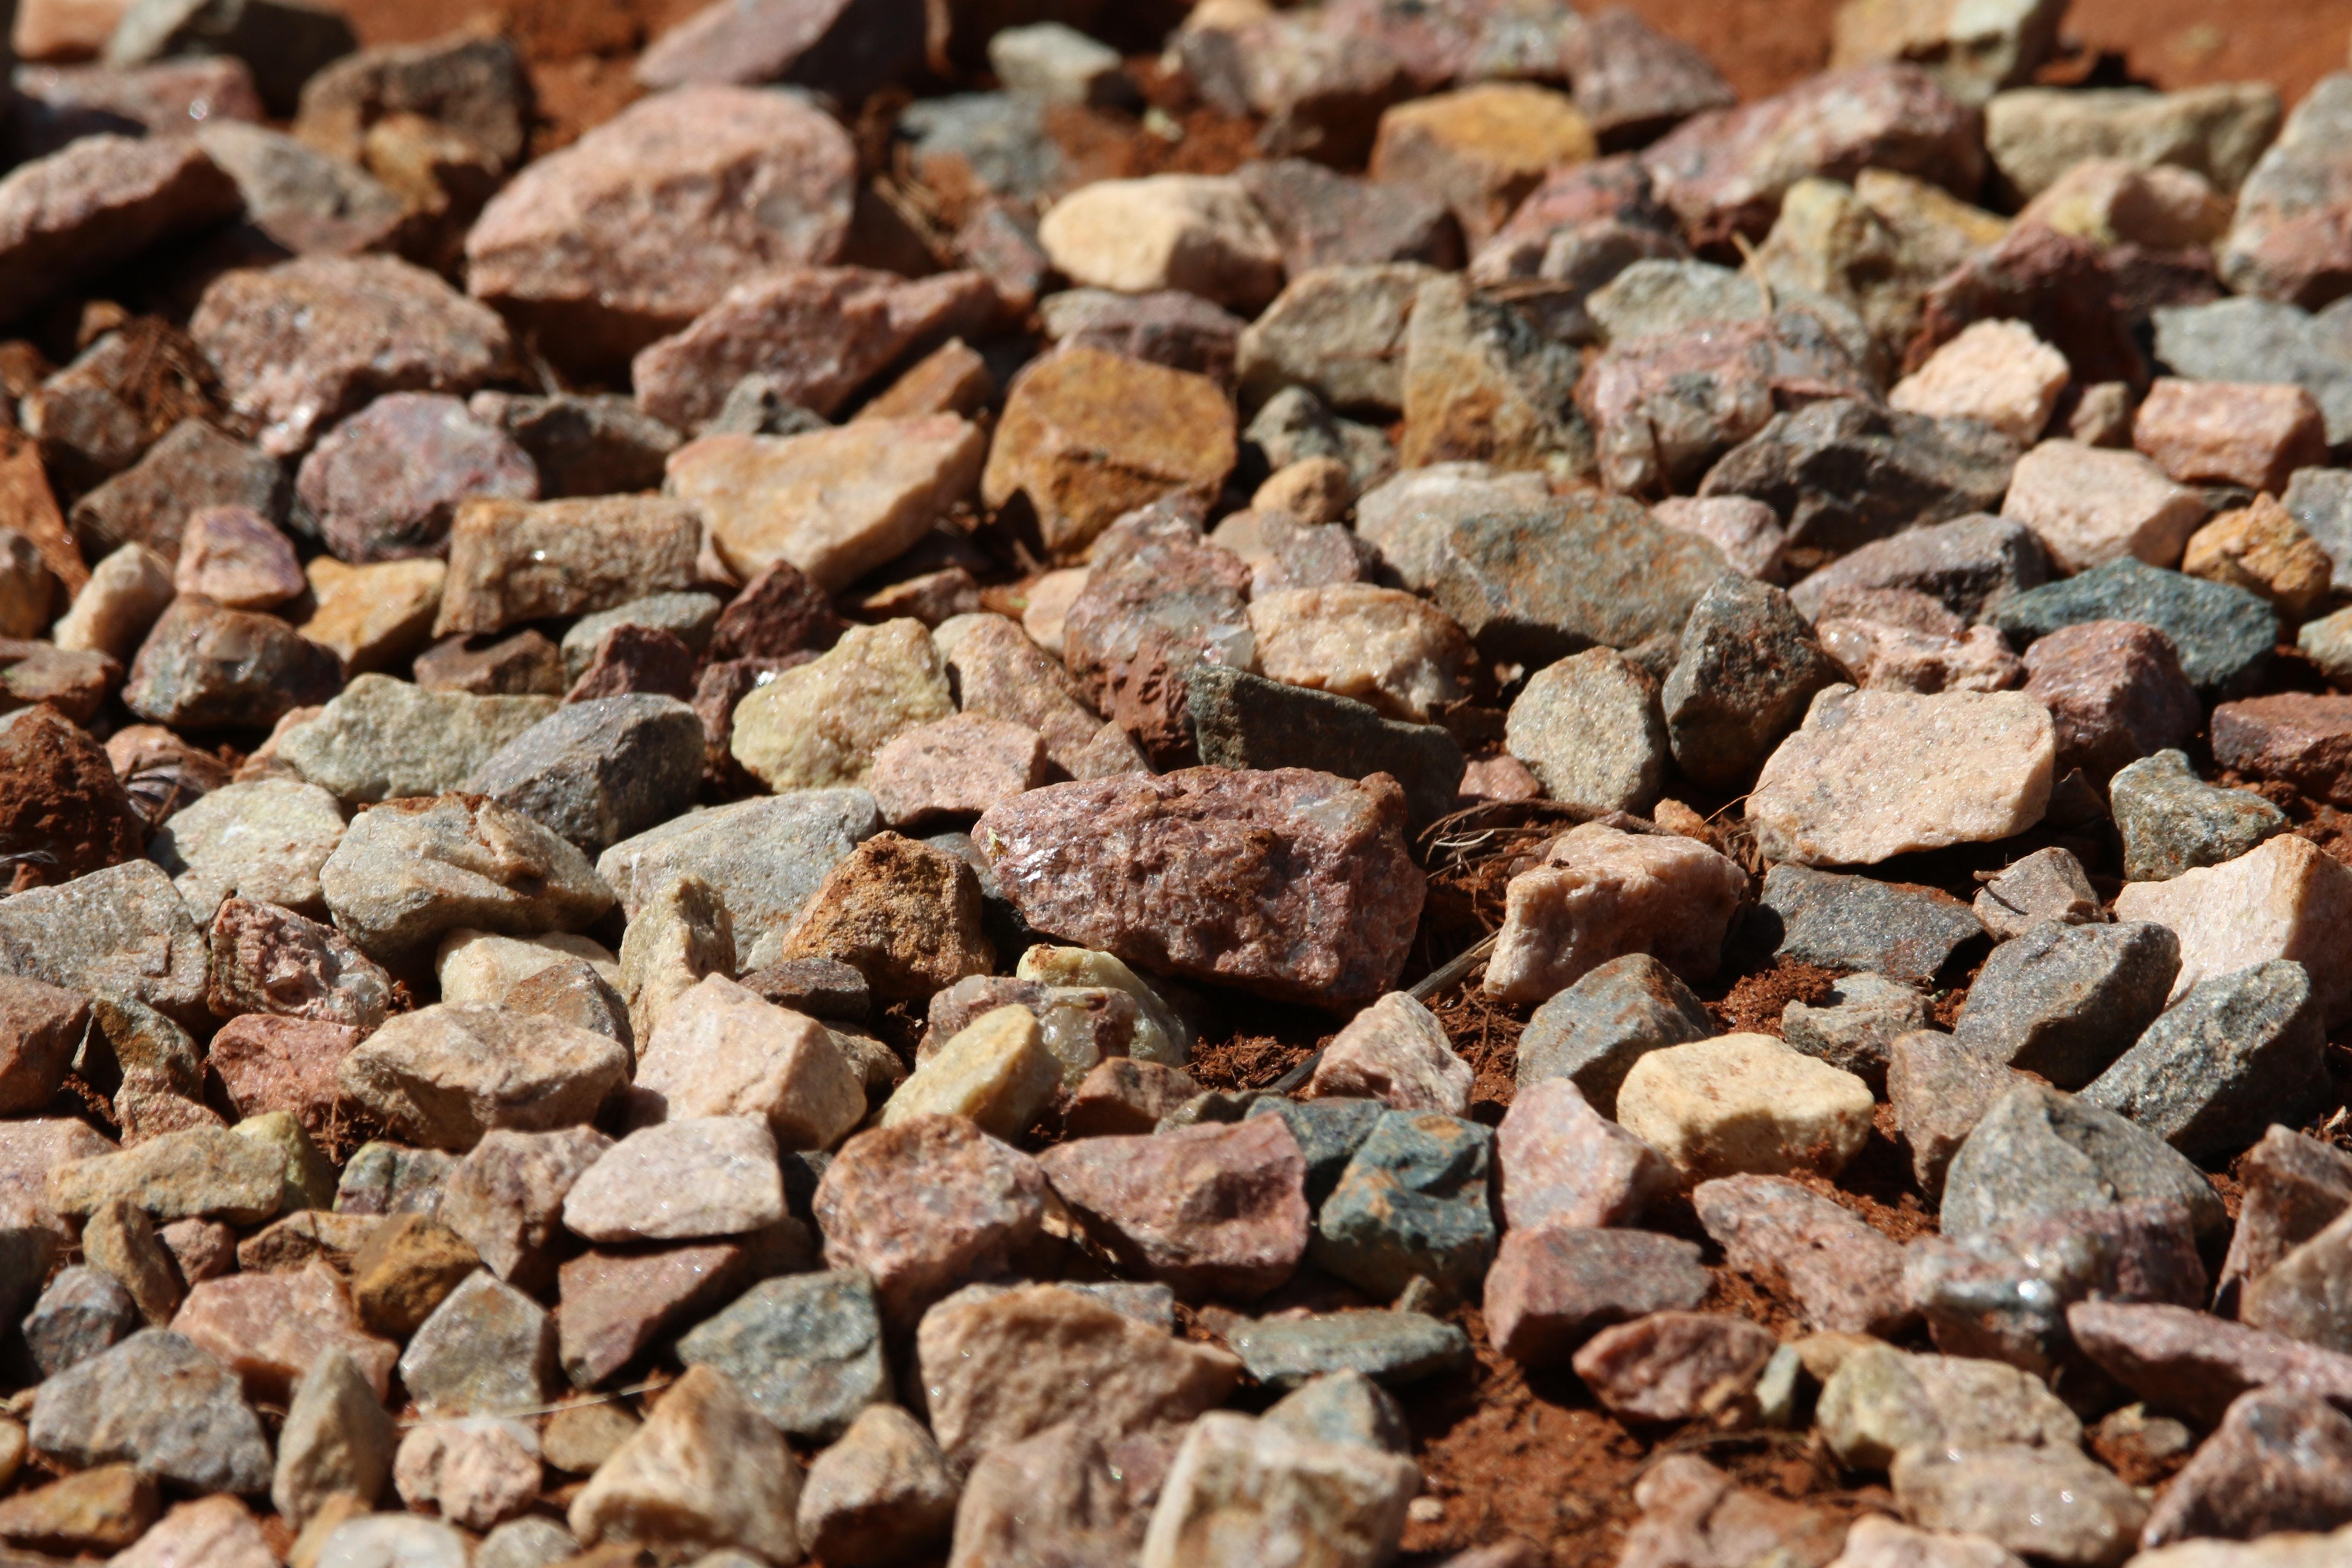 Pile of rocks photo